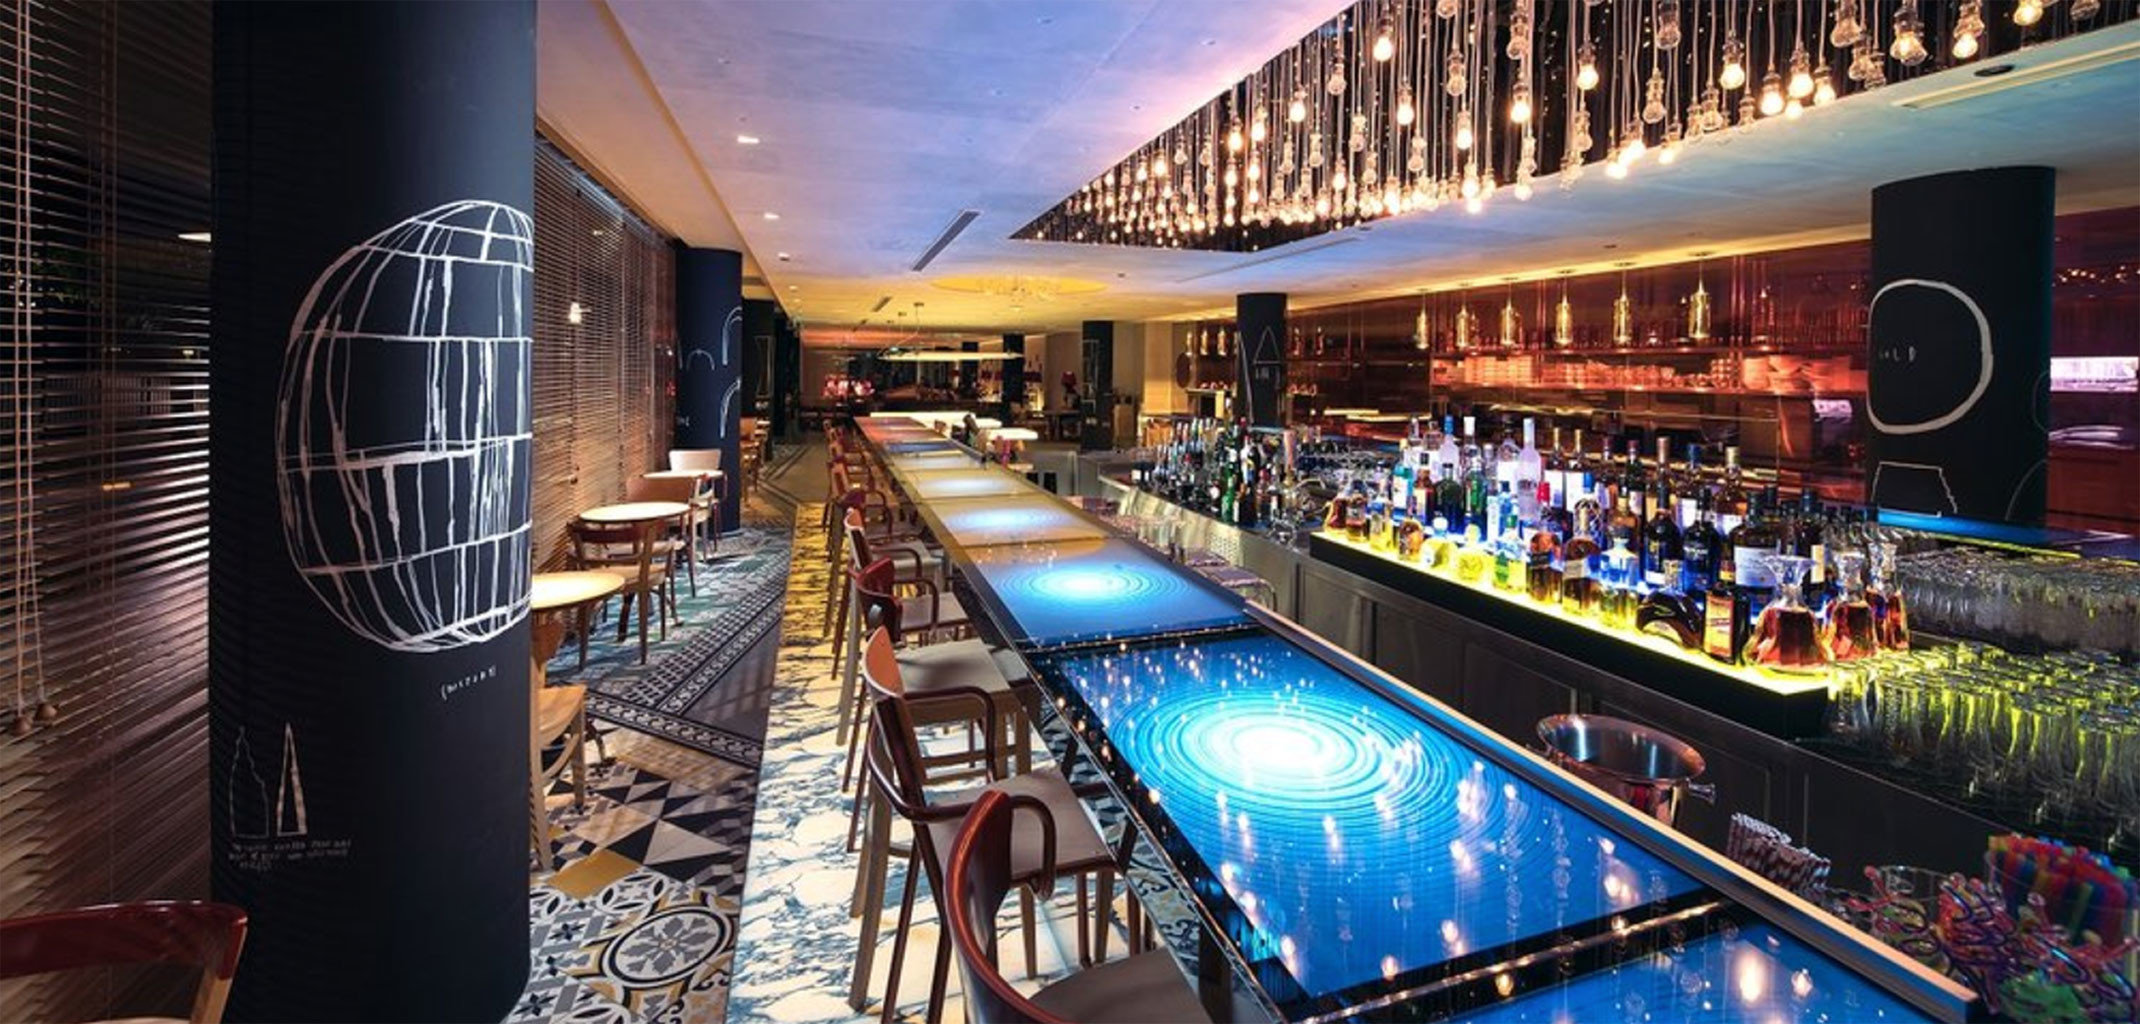 Hotels Romance indoor leisure Bar nightclub Casino